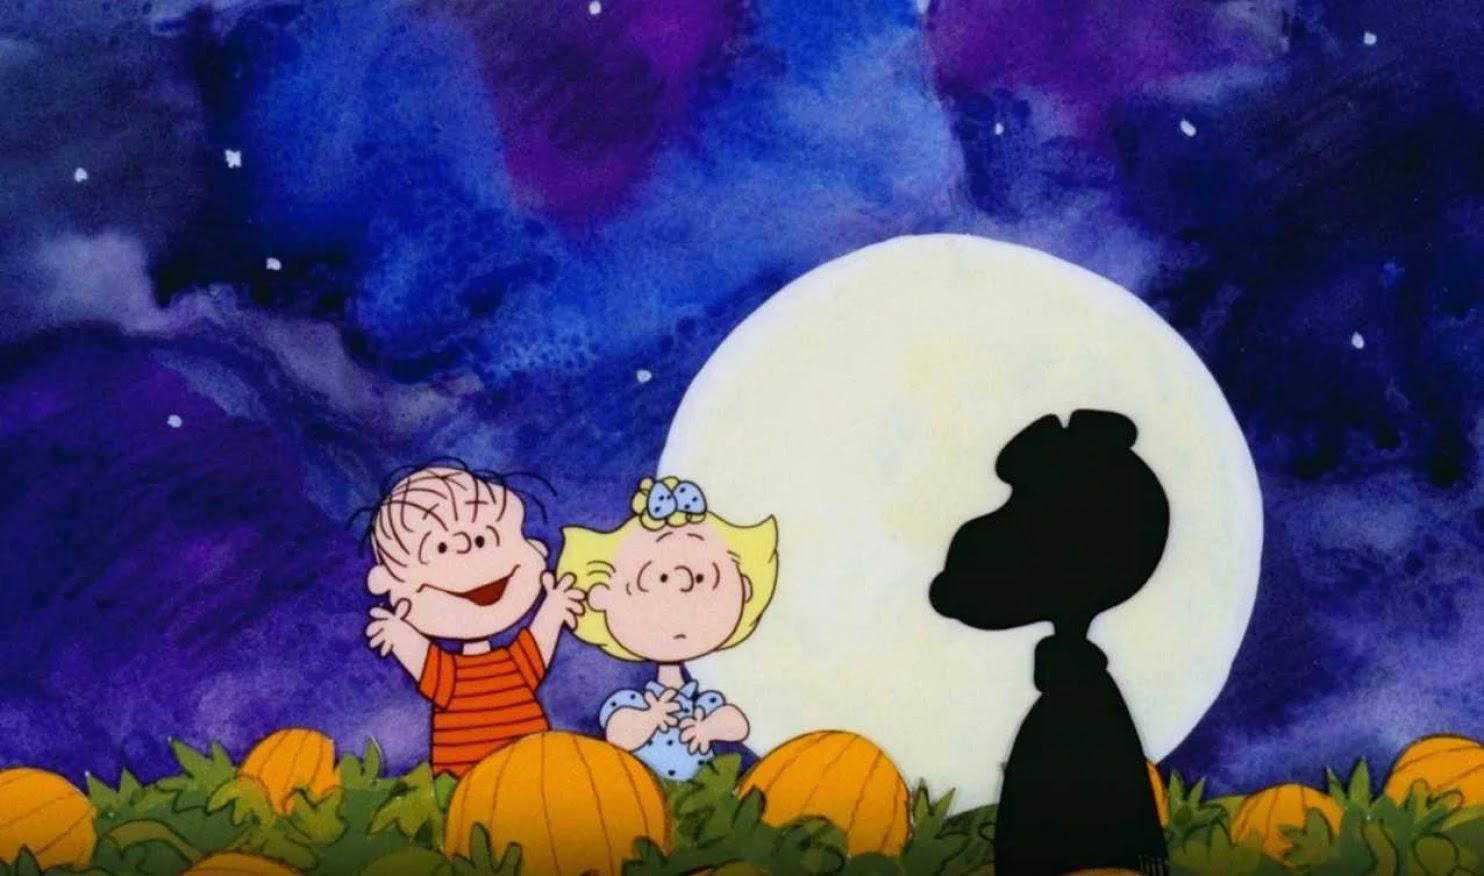 Monster Island News: It's The Great Pumpkin Charlie Brown ...